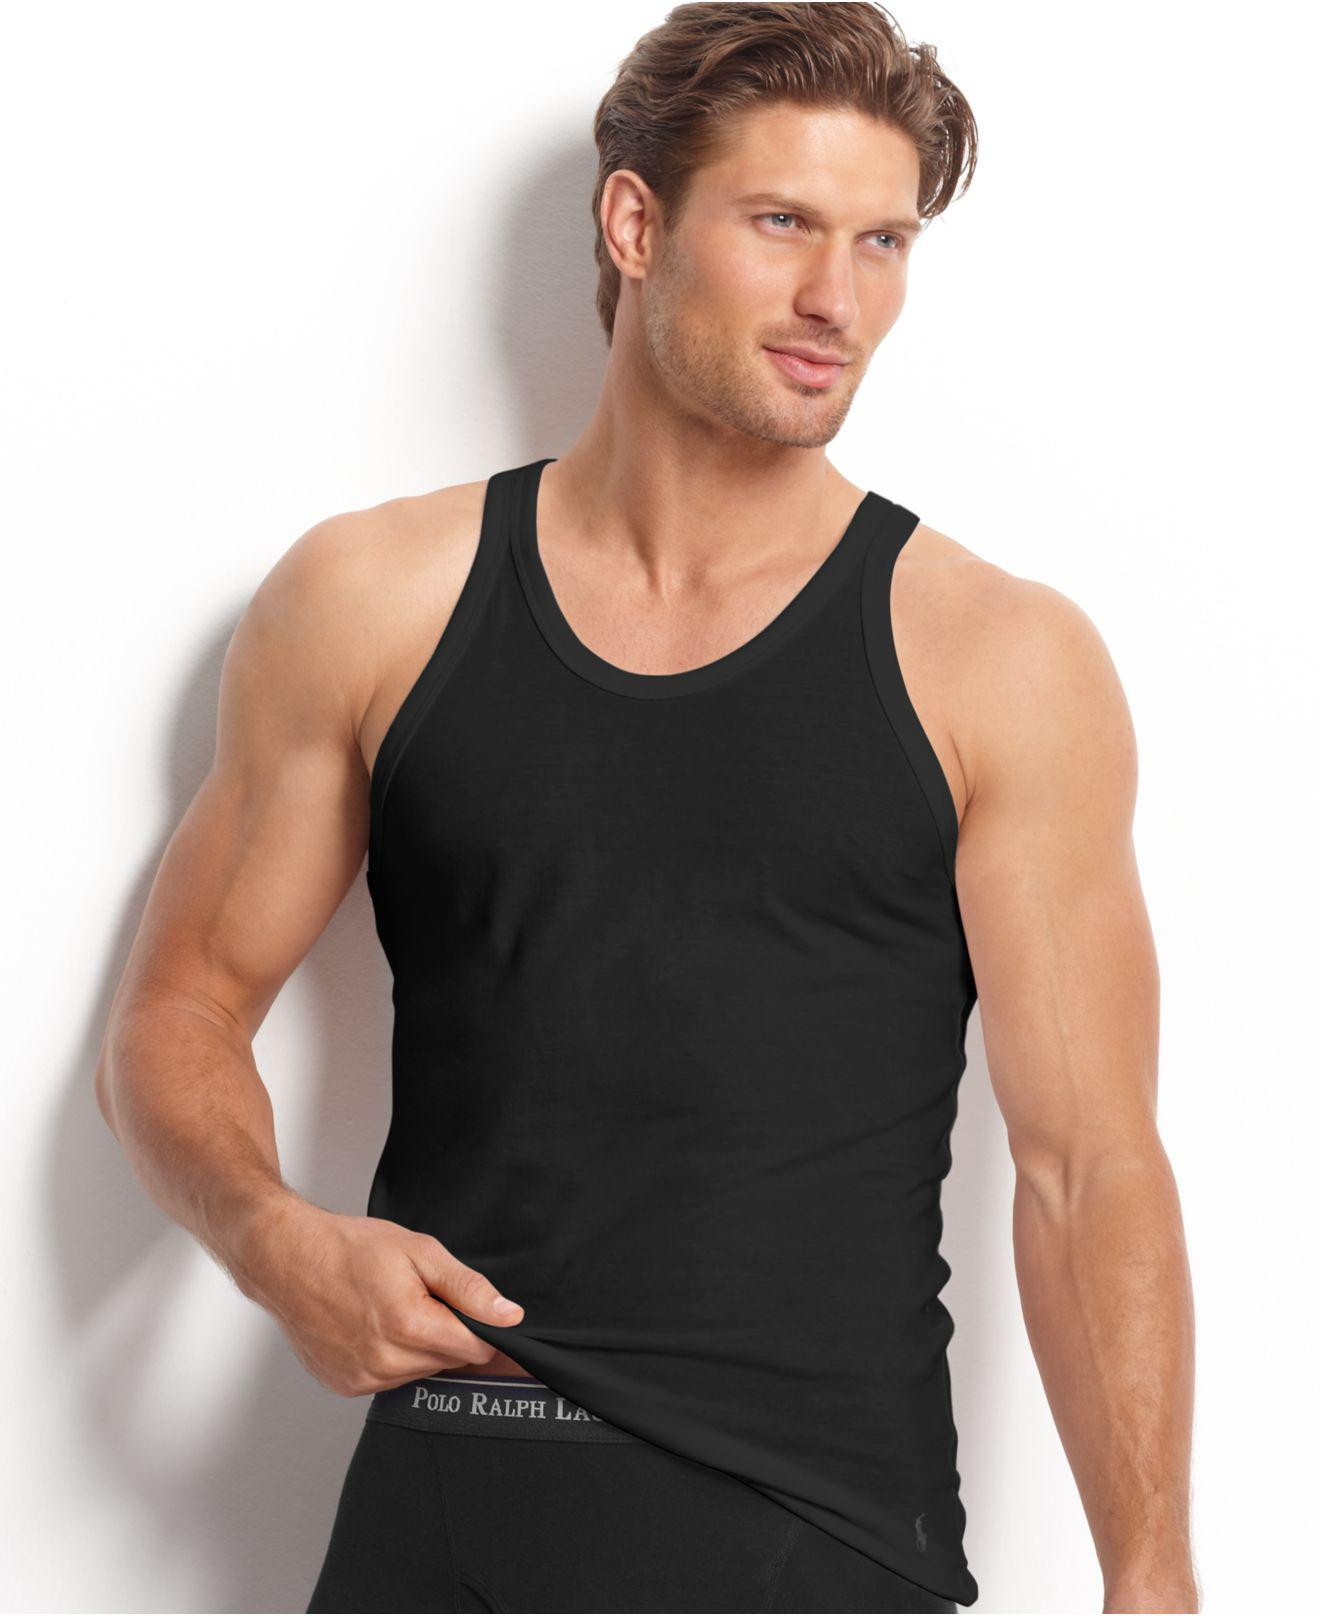 b84433b7d2e84f Polo Ralph Lauren. Black Men s Underwear ...